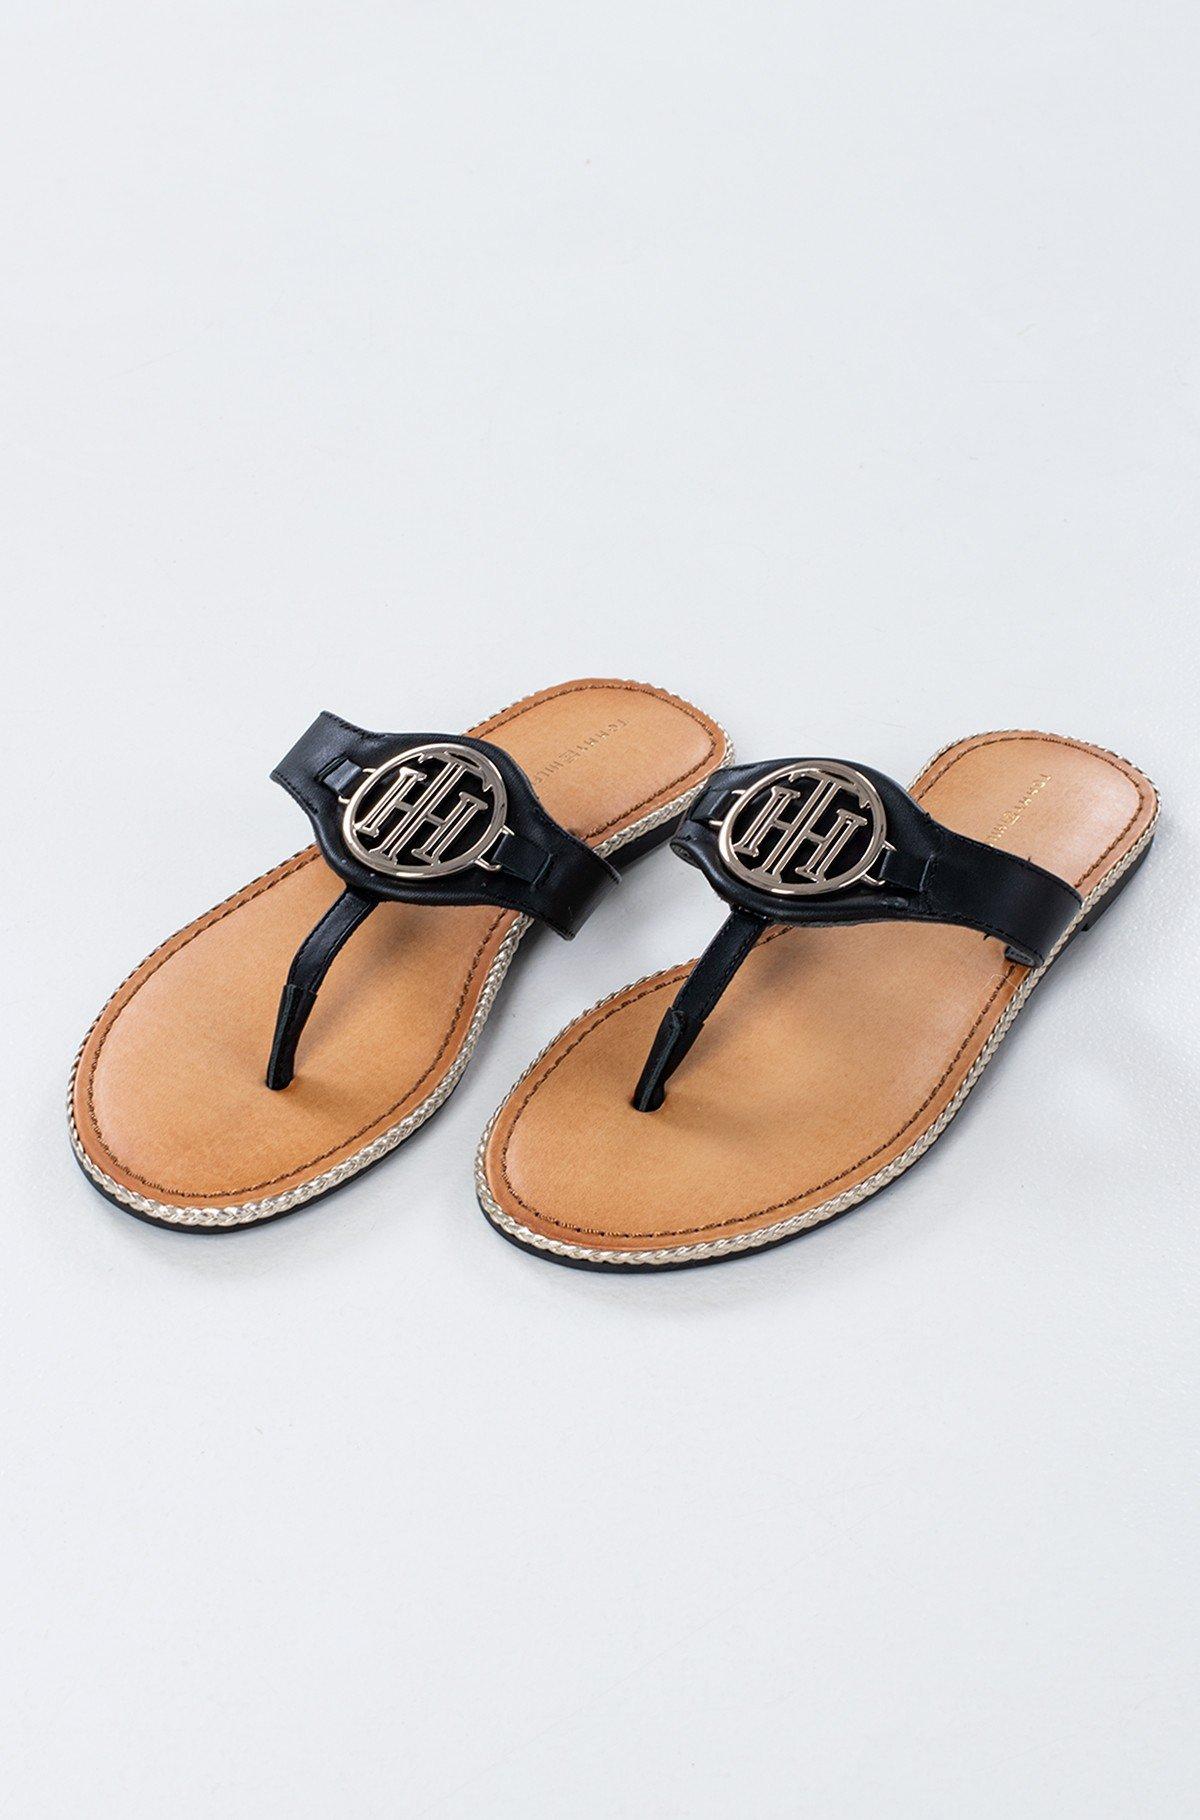 Sandals ESSENTIAL LEATHER FLAT SANDAL-full-1